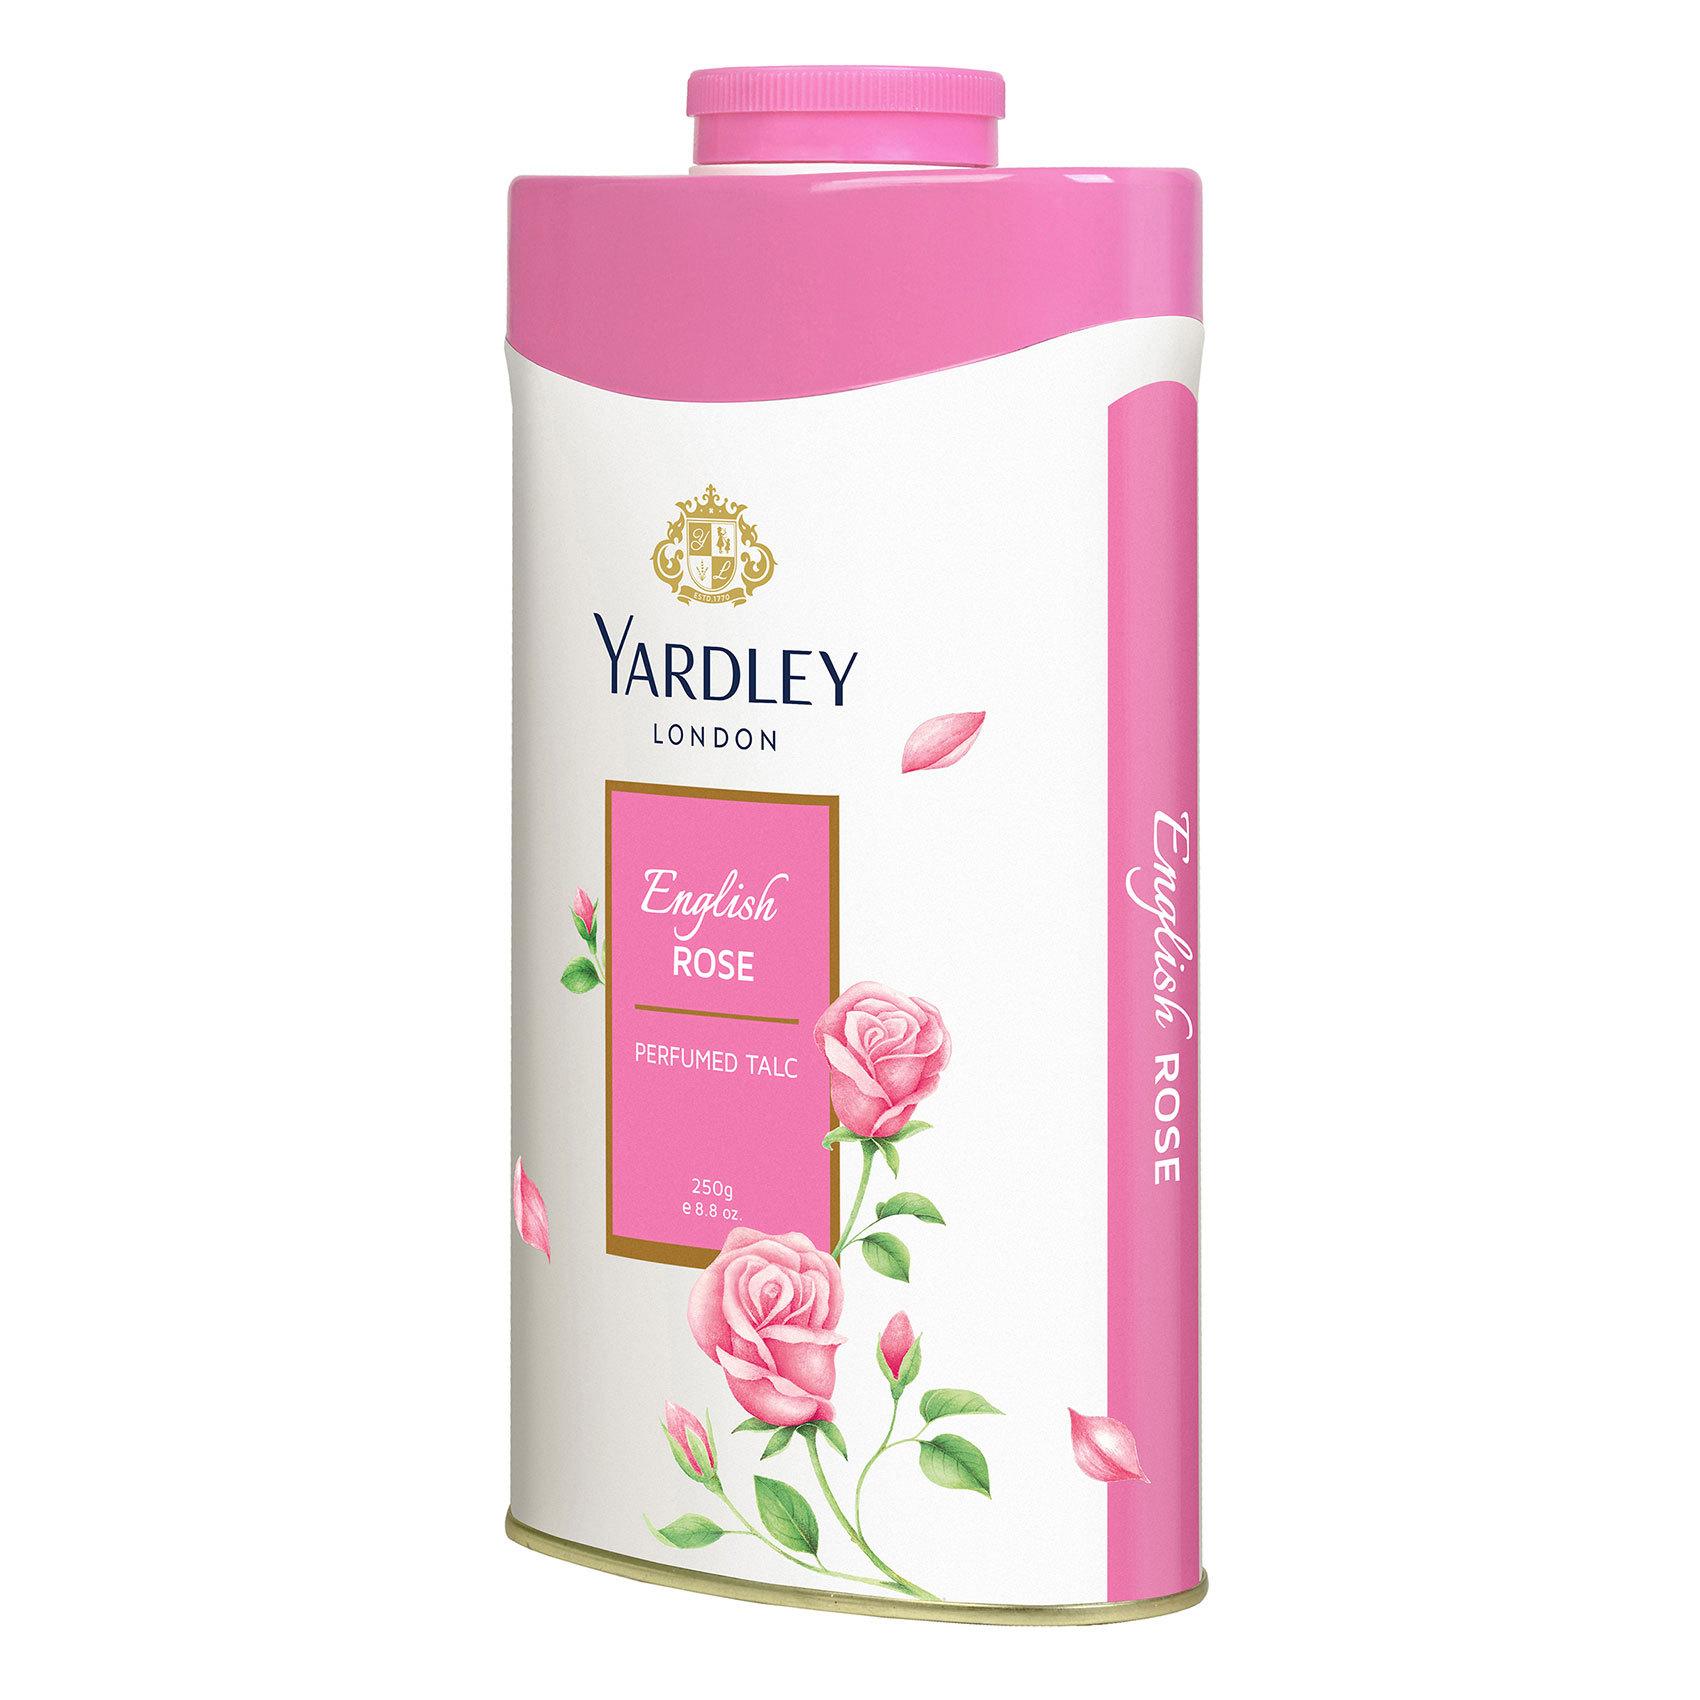 YARDLEY ENG. ROSE TALC 250G